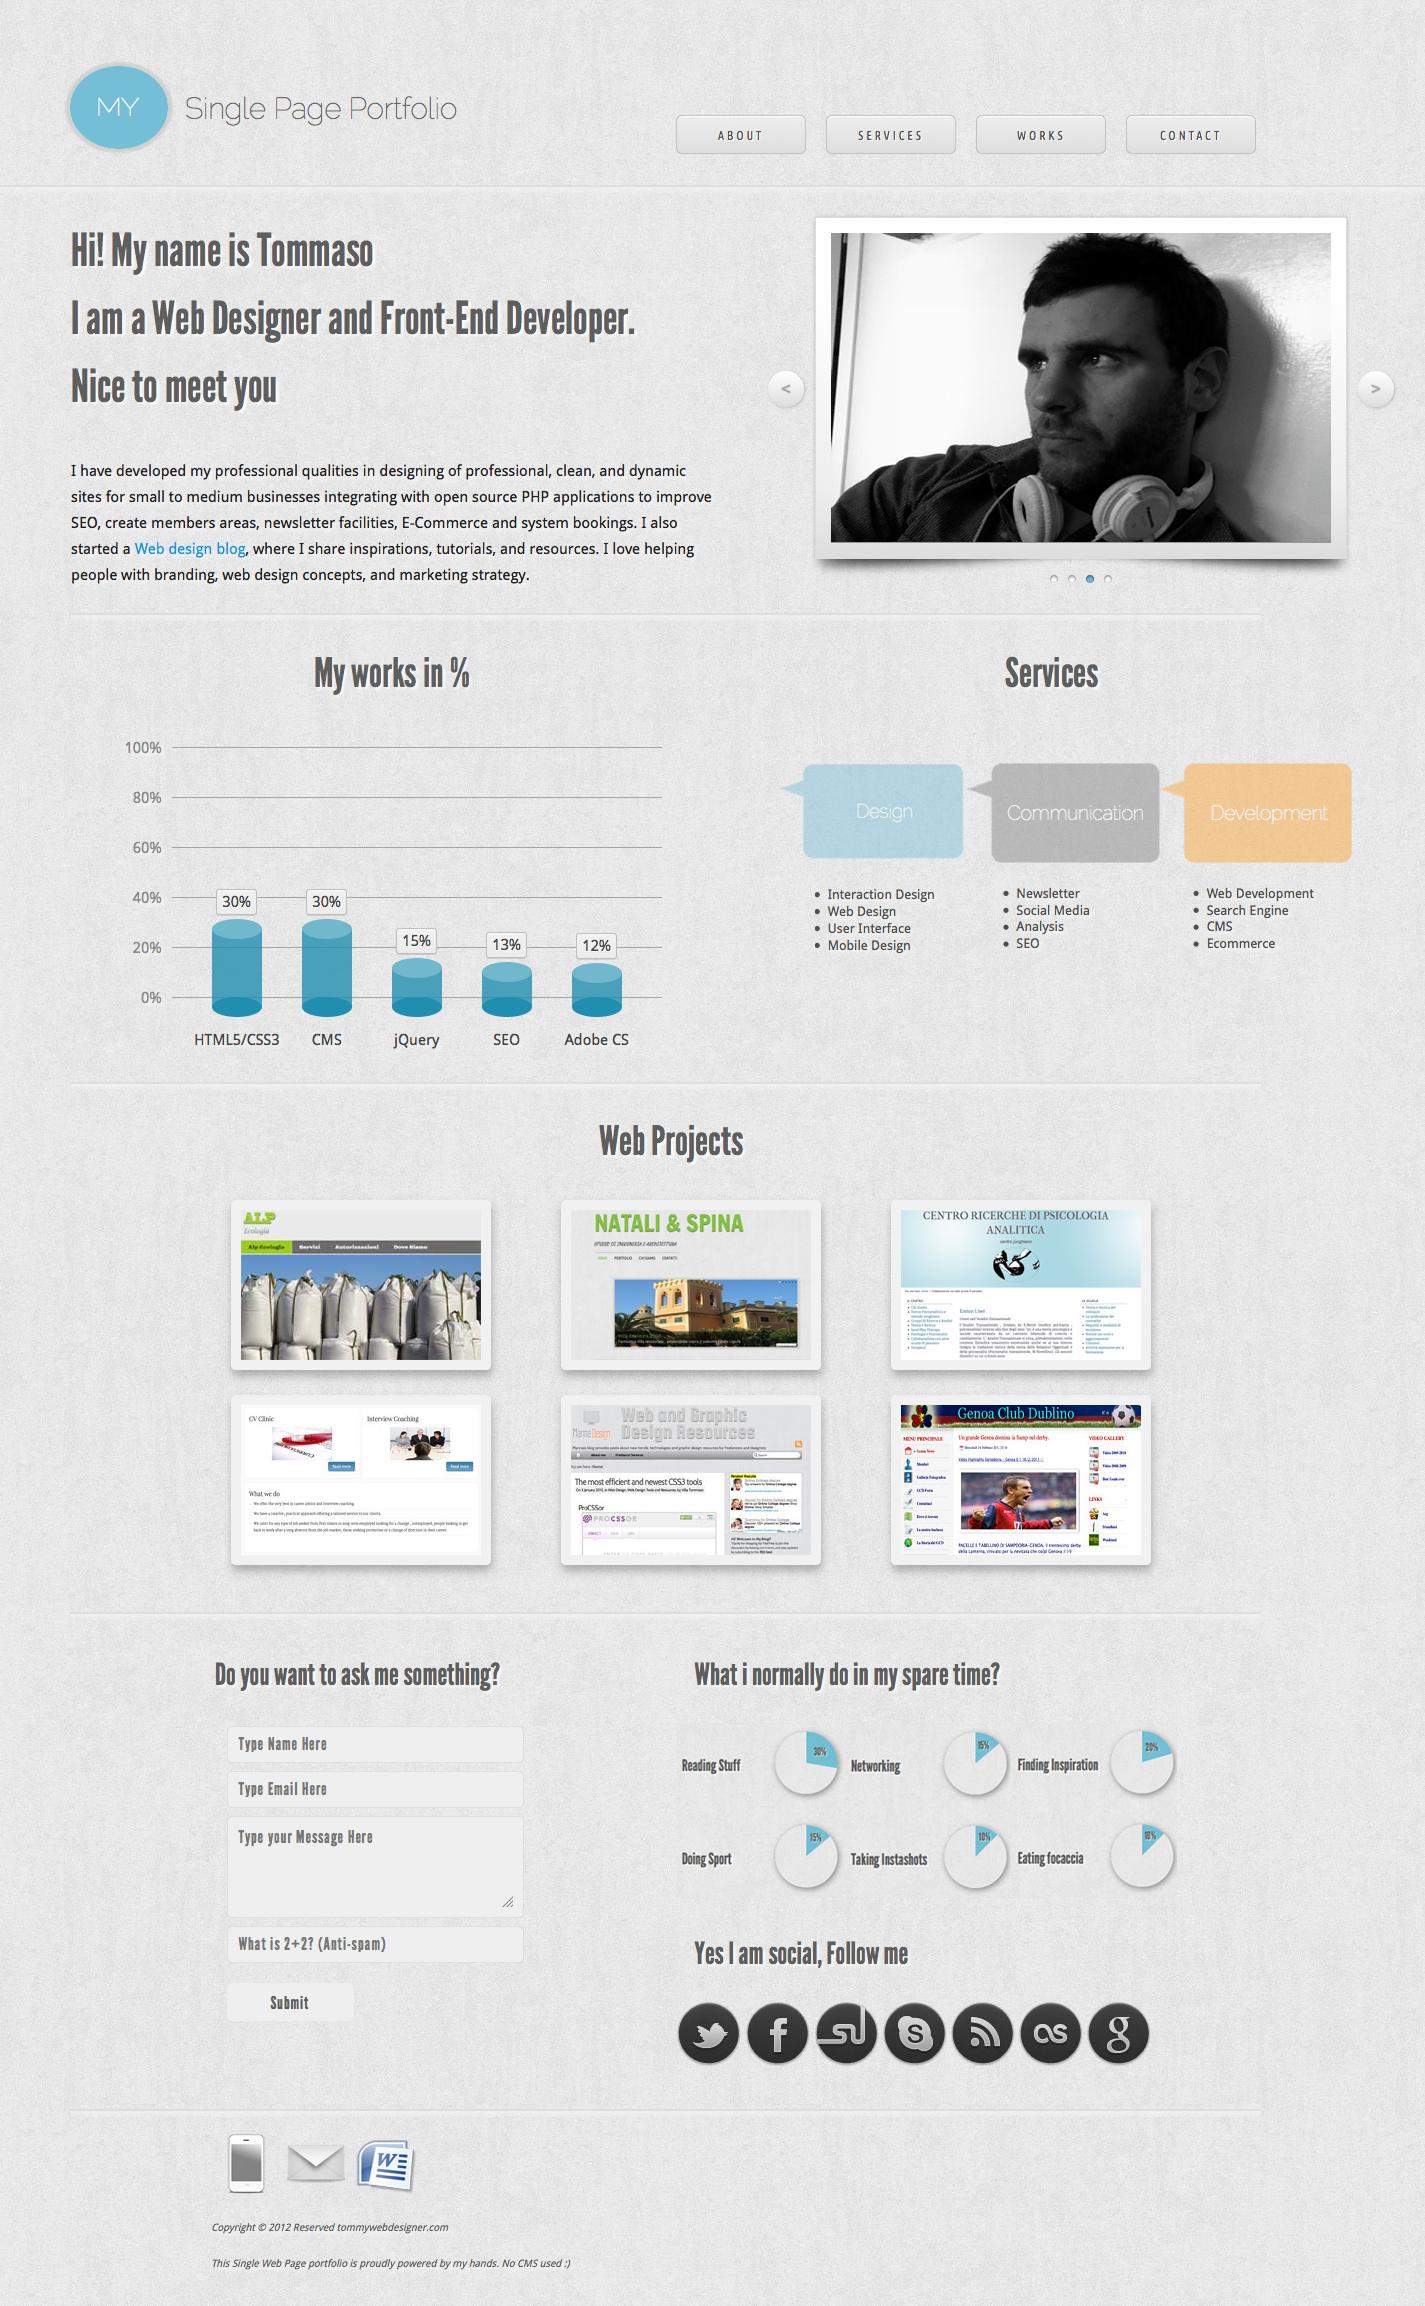 This Is A Single Page Portfolio Web Design Web Design Inspiration Portfolio Design